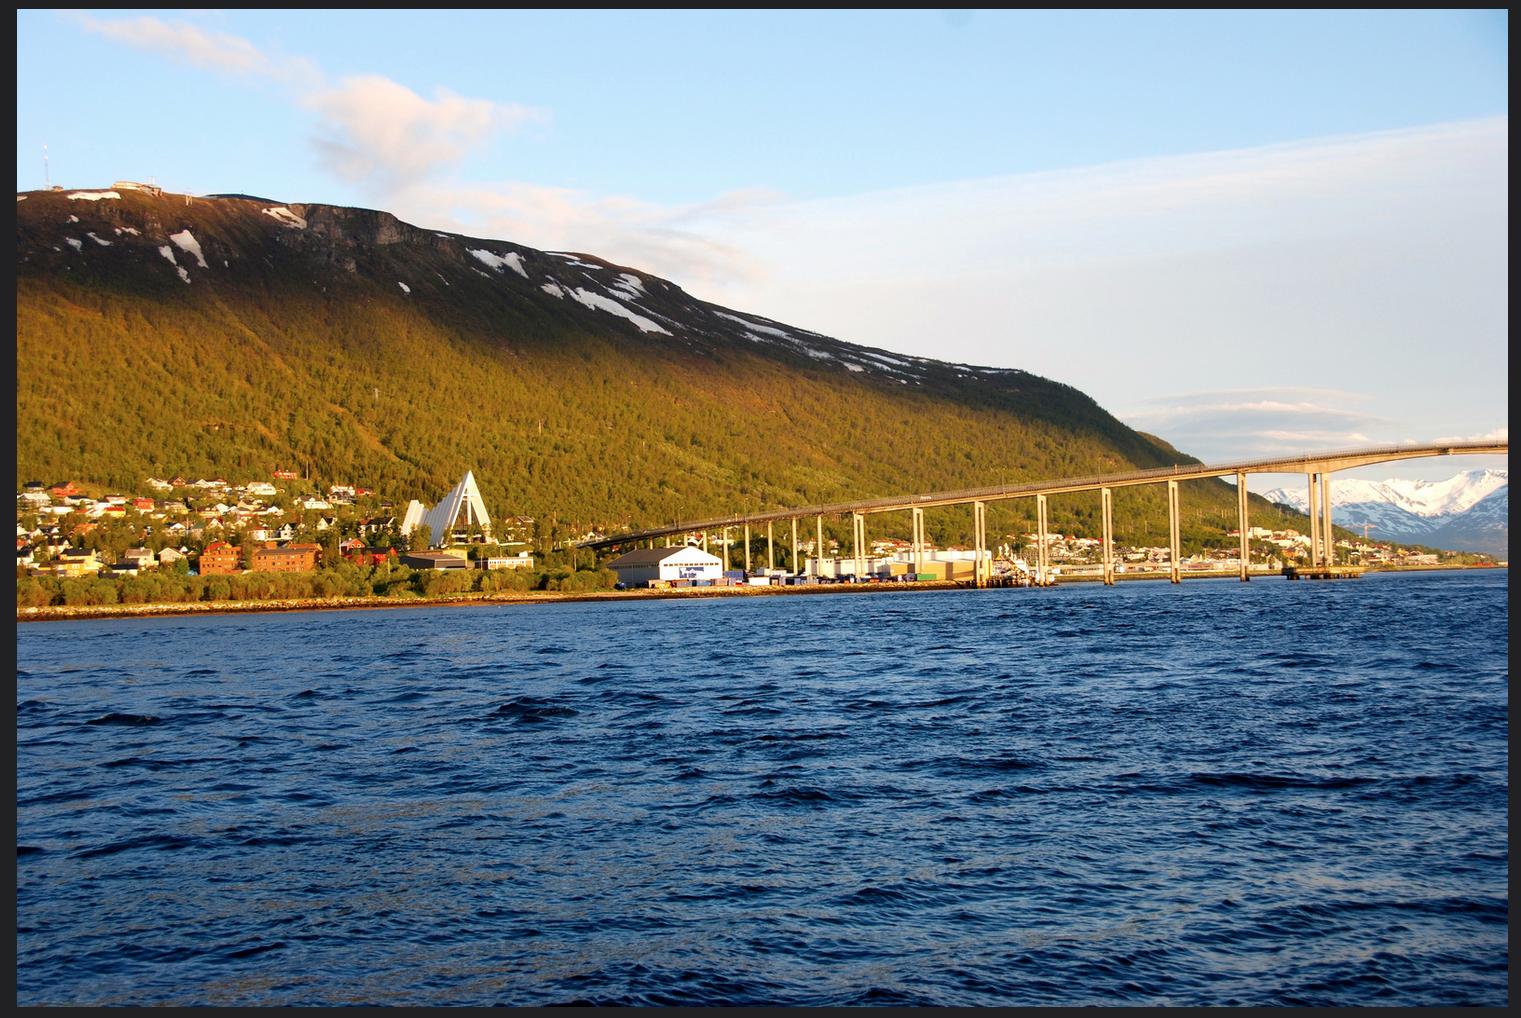 #Tromso |#Midnightsun | Arctic Princess | VIP